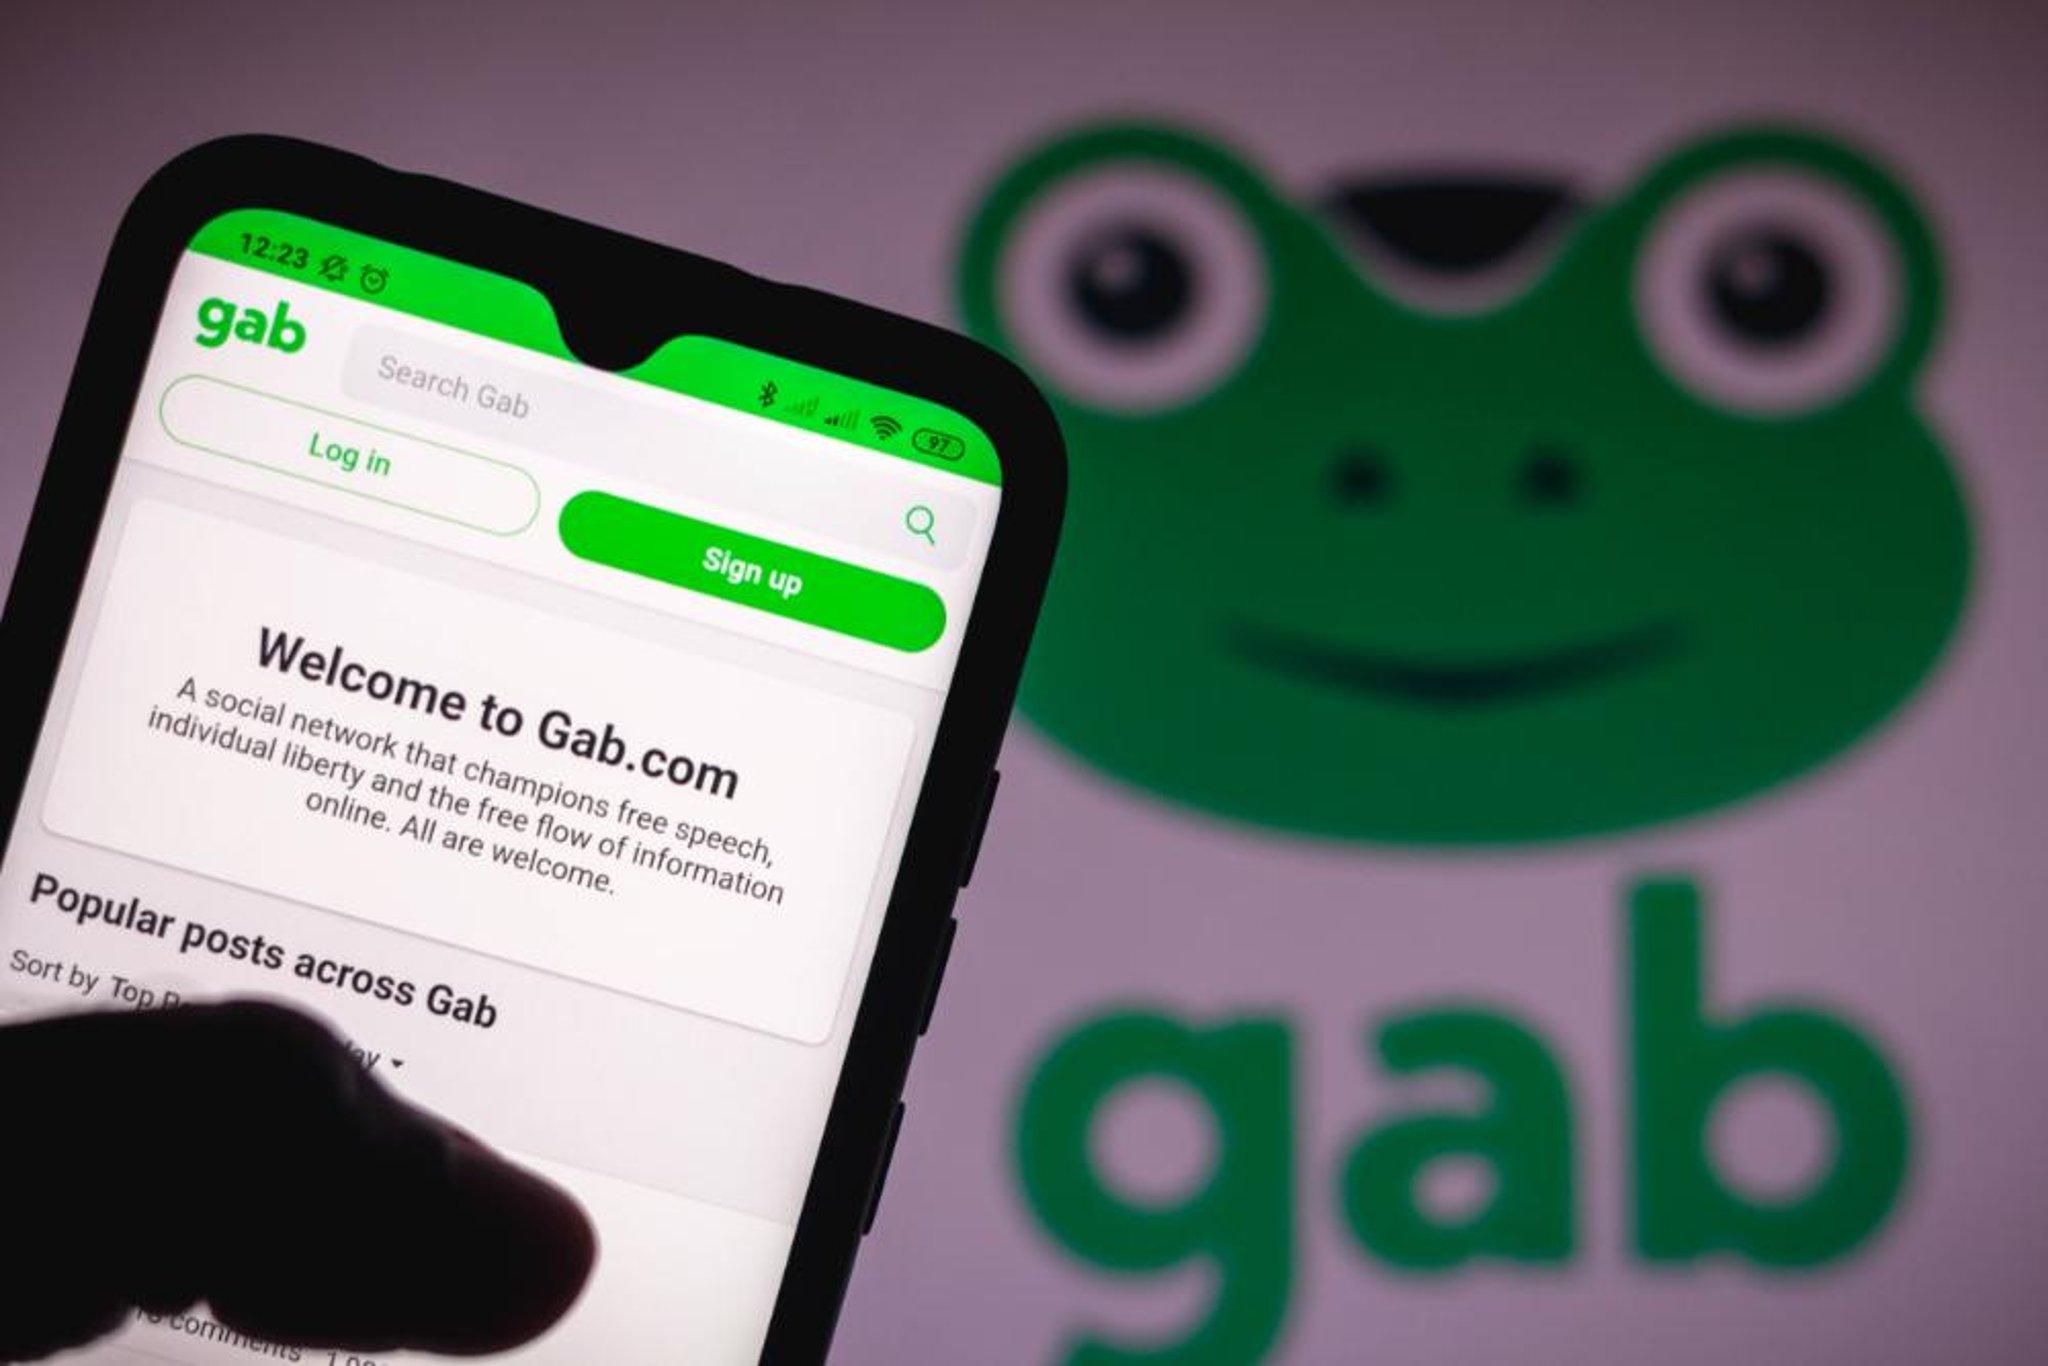 Gab social network